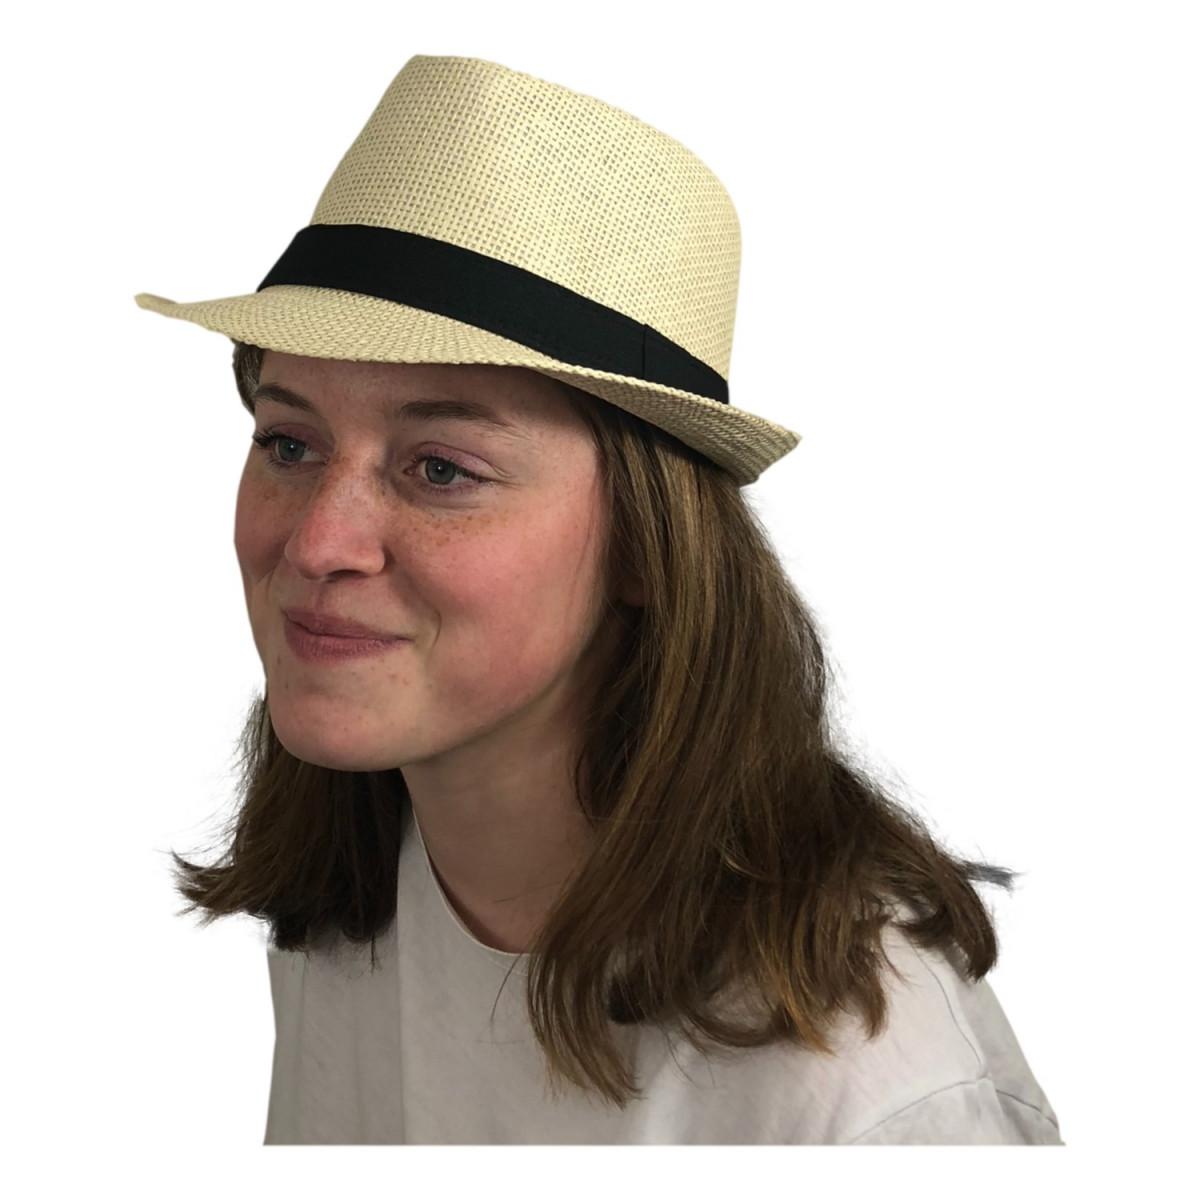 https://www.boutique-augustin.com/1769-thickbox/chapeau-paille-borsalino-style-panama-galon-uni.jpg